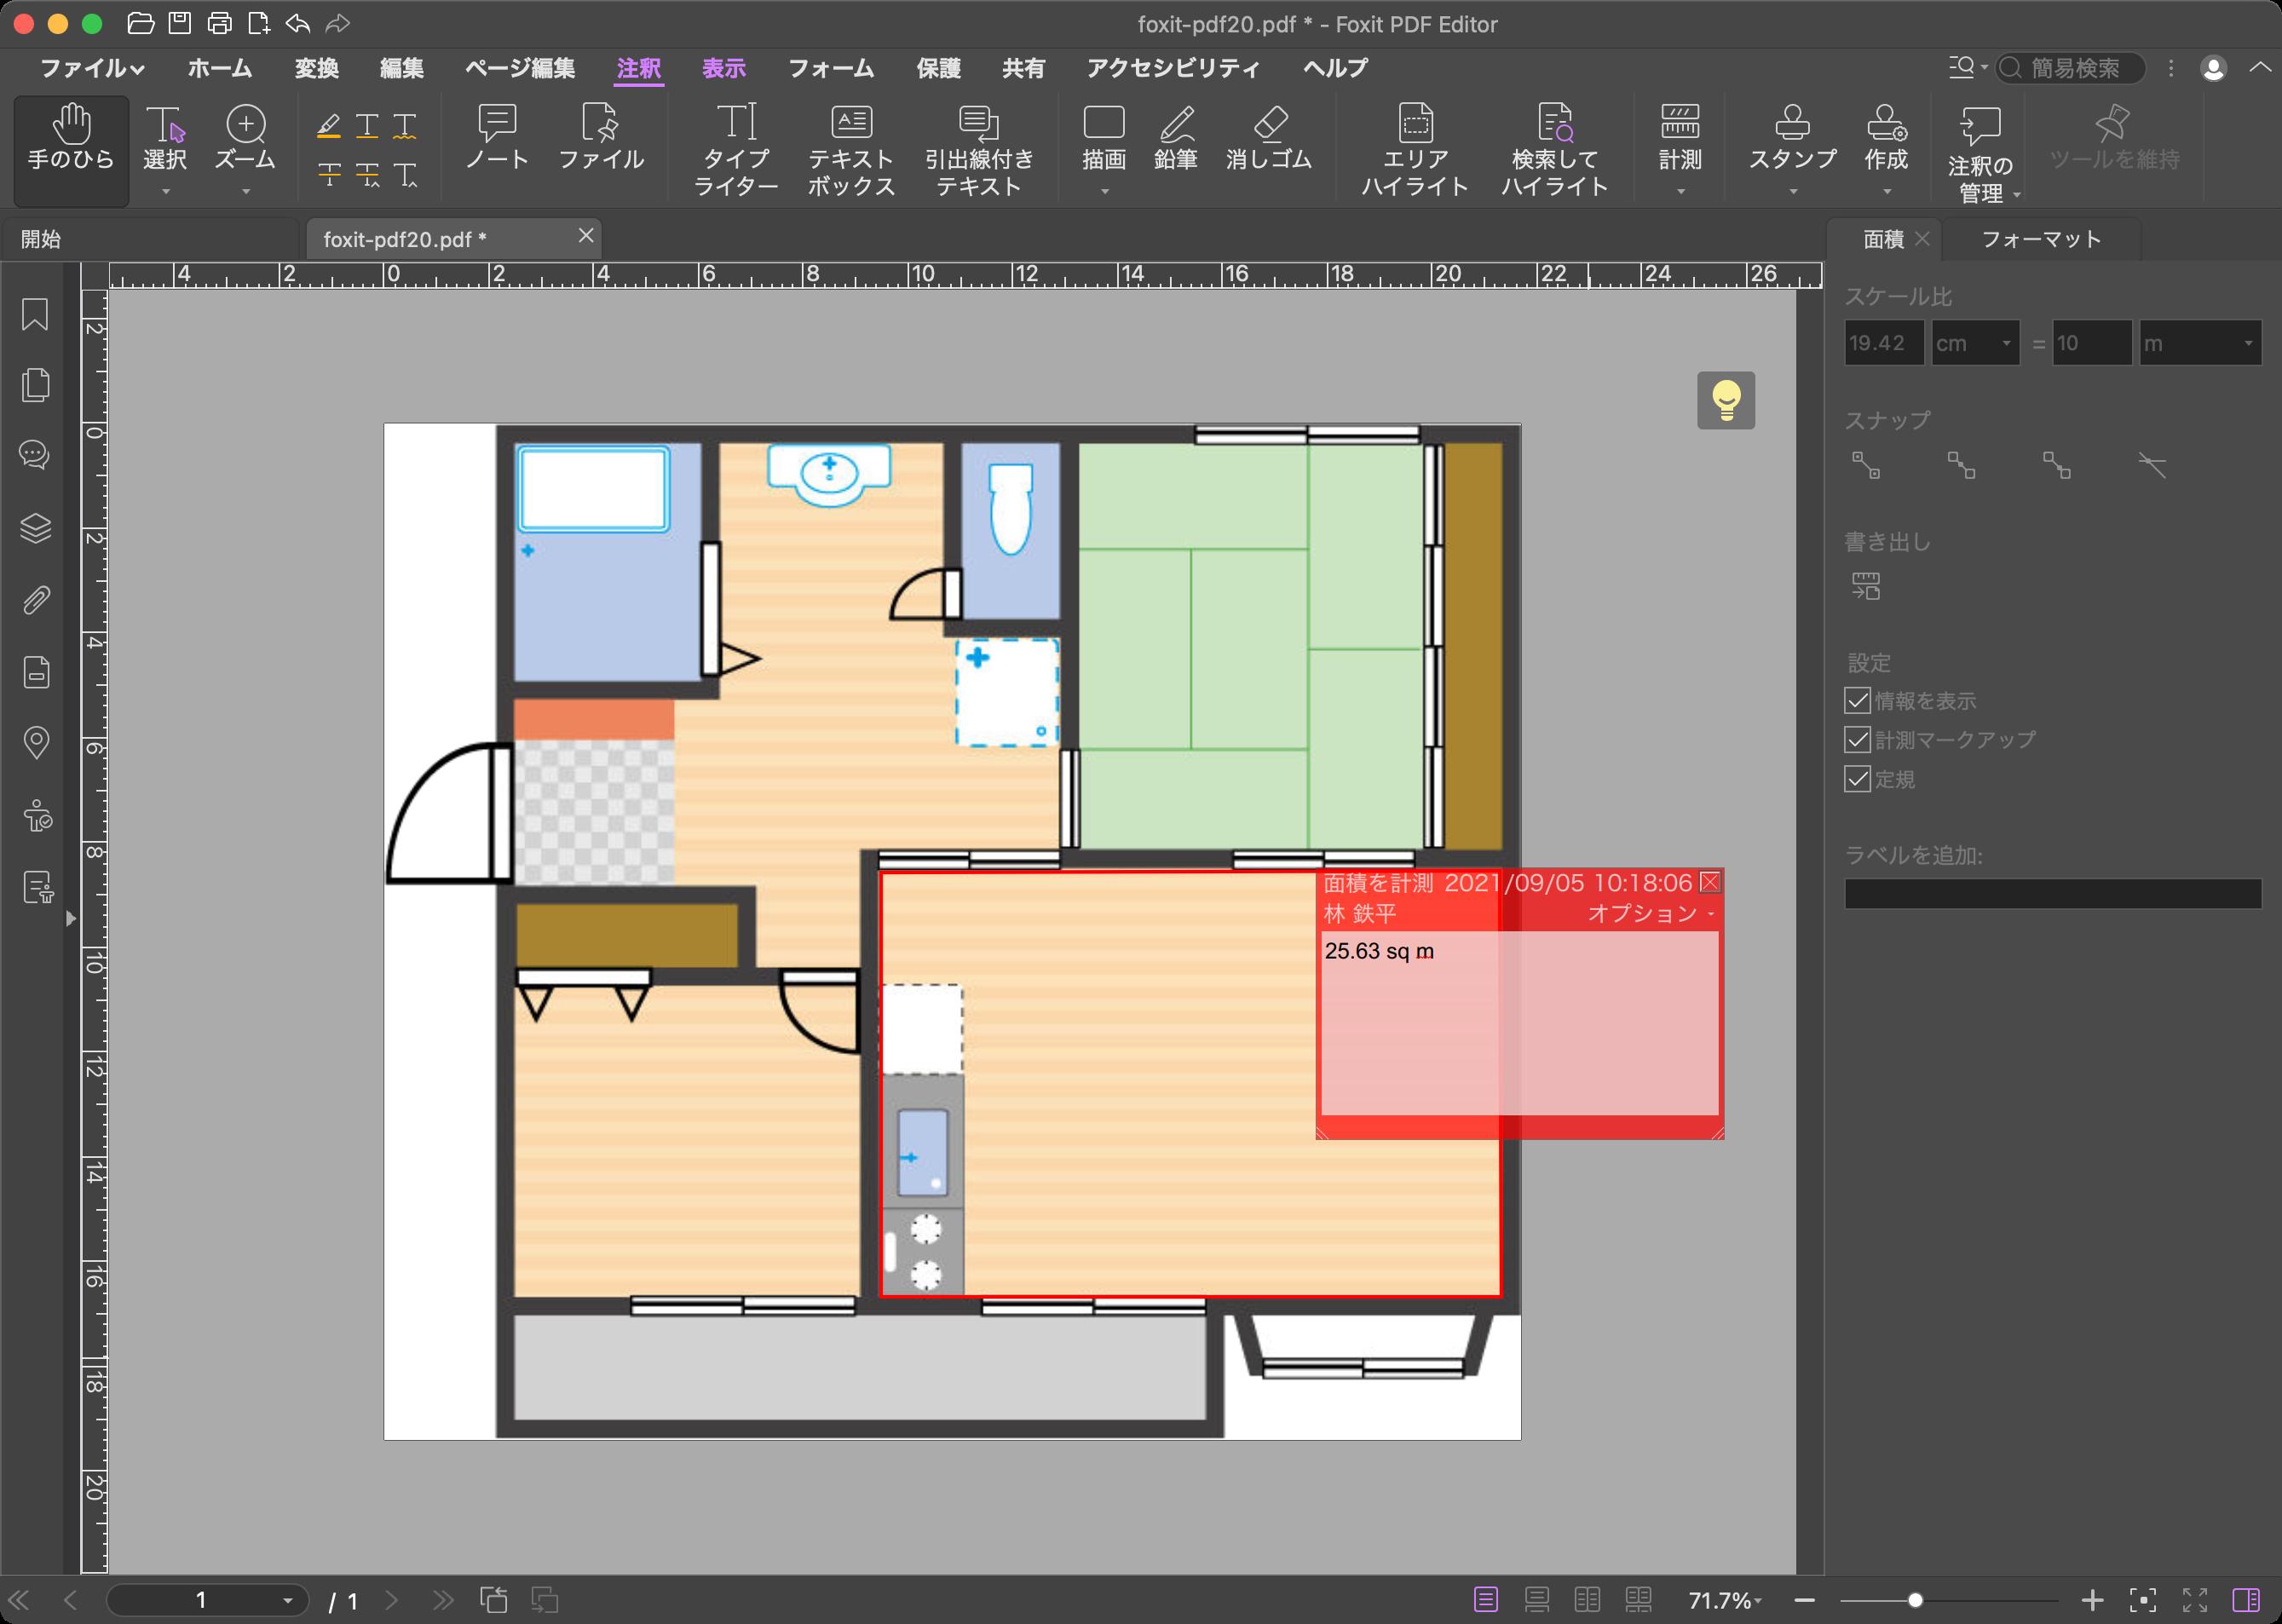 Foxit PDF Editor 面積を計測